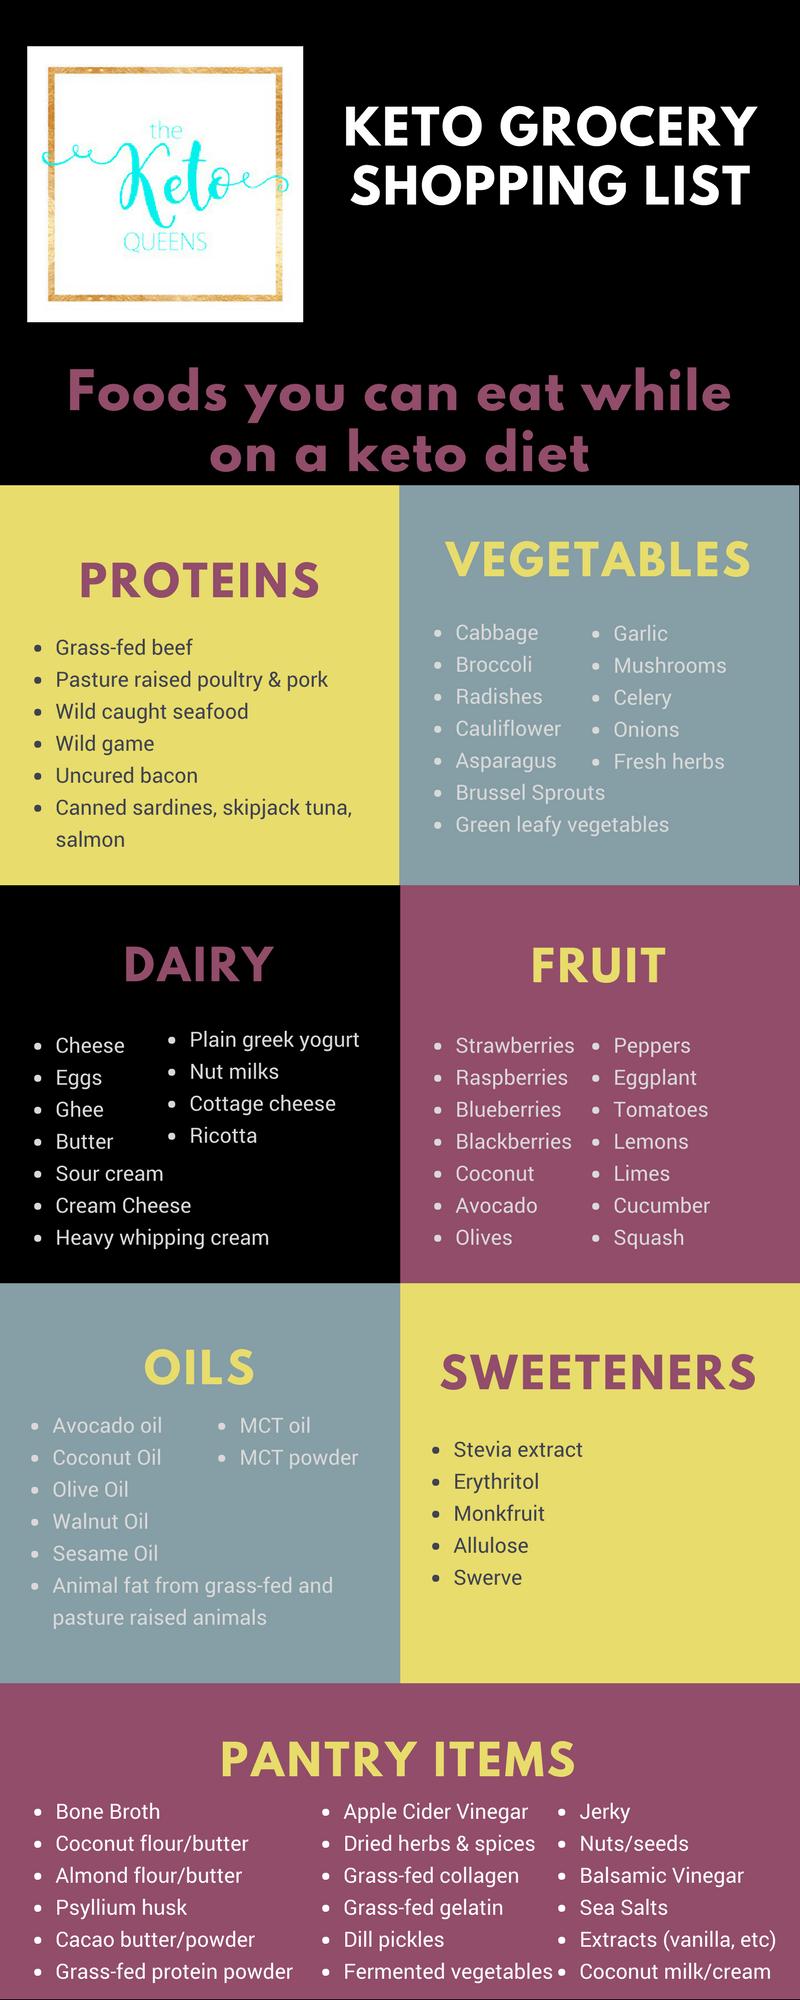 standard grocery shopping list